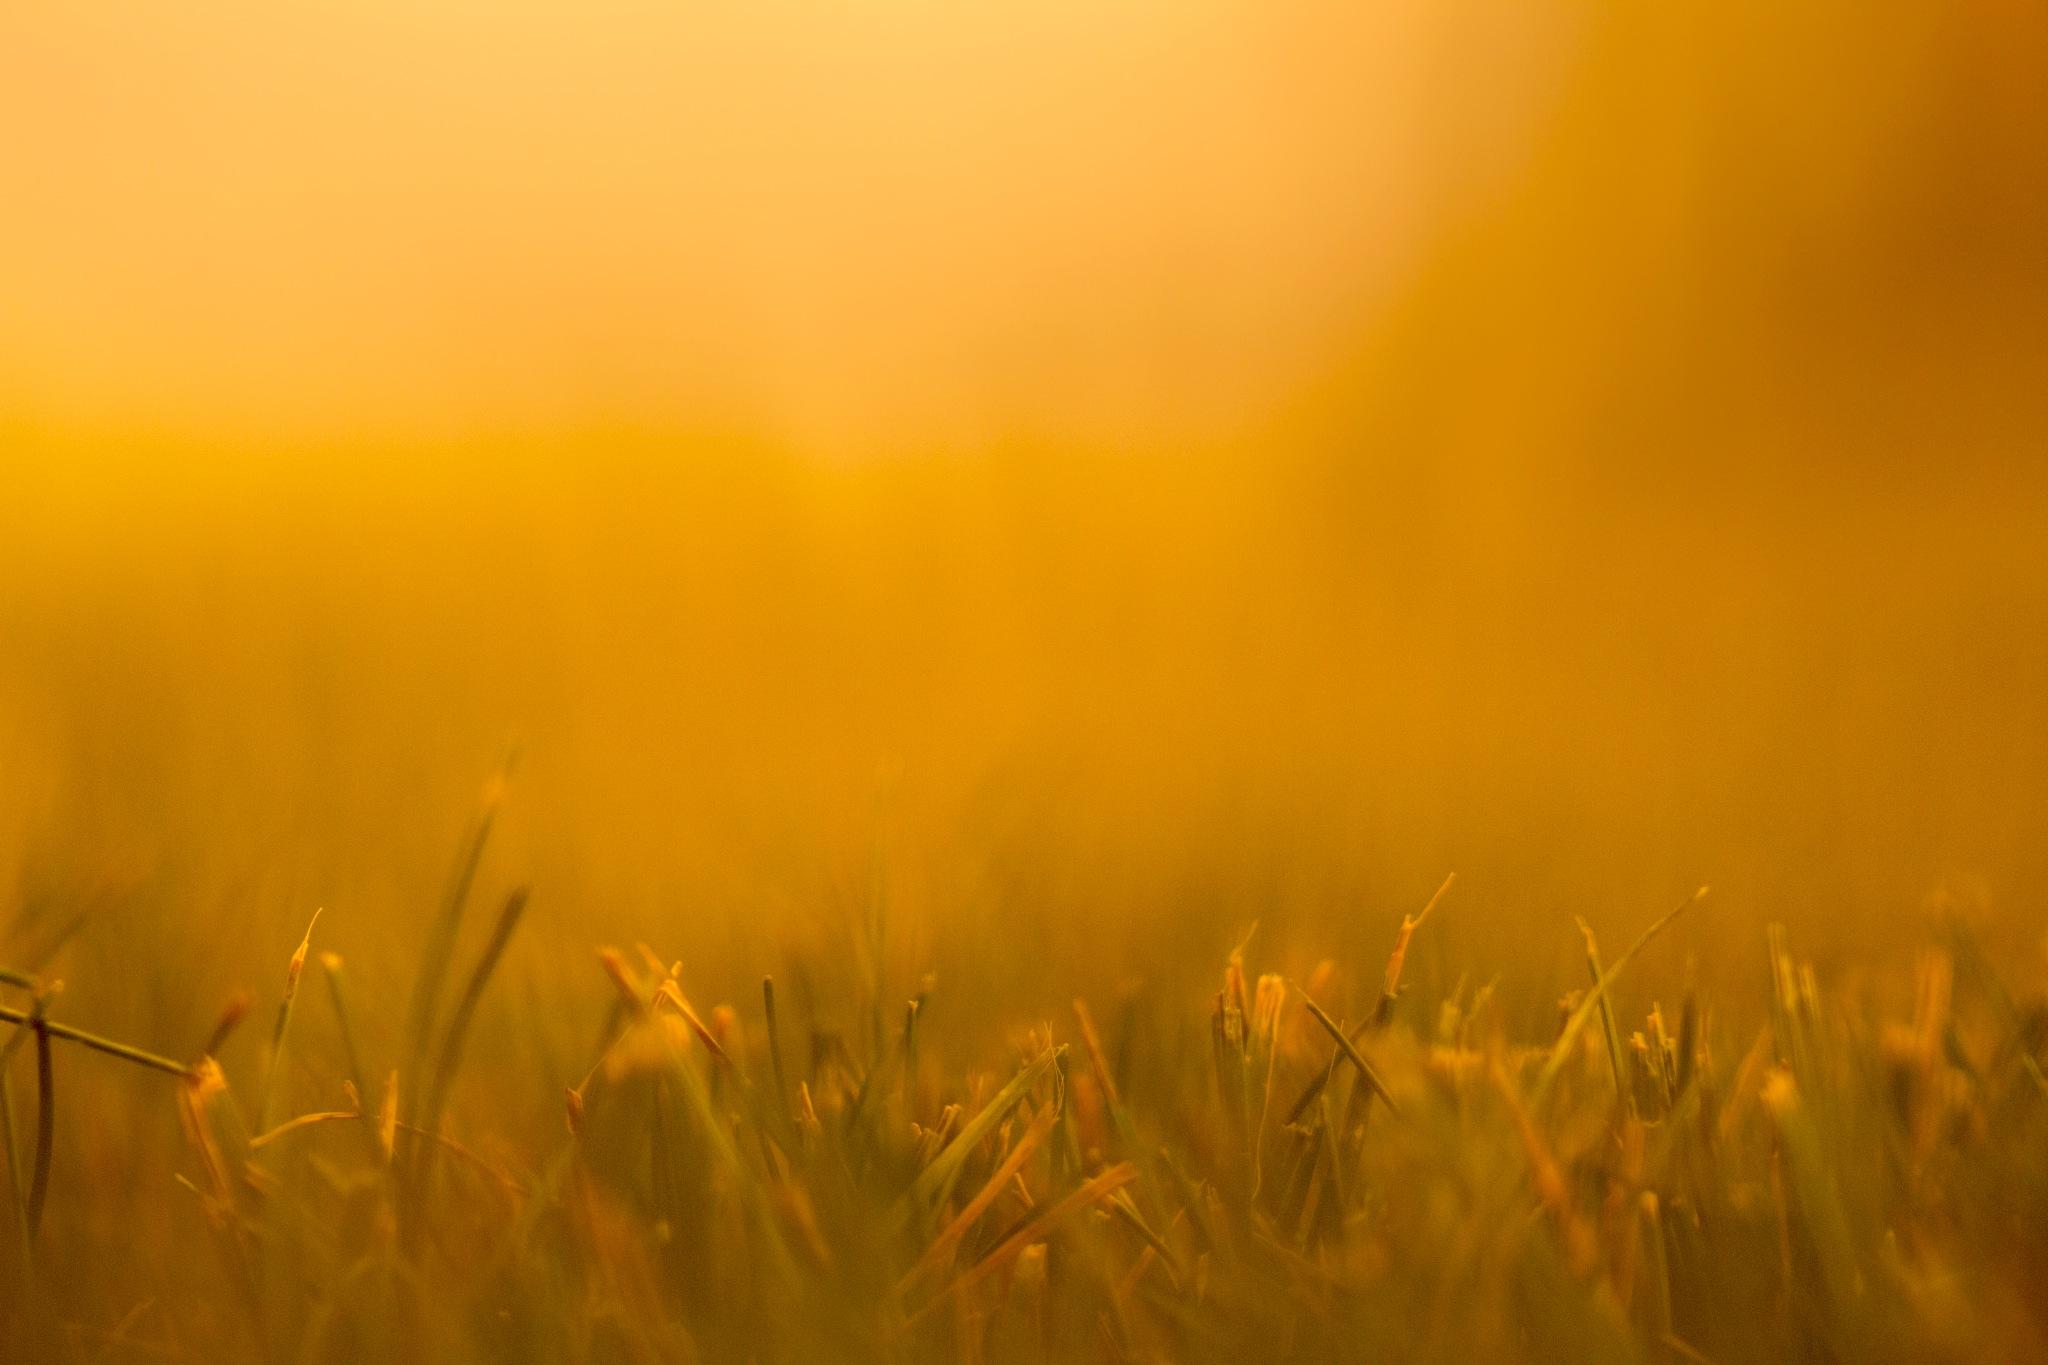 Grass by Mattias Carlsson